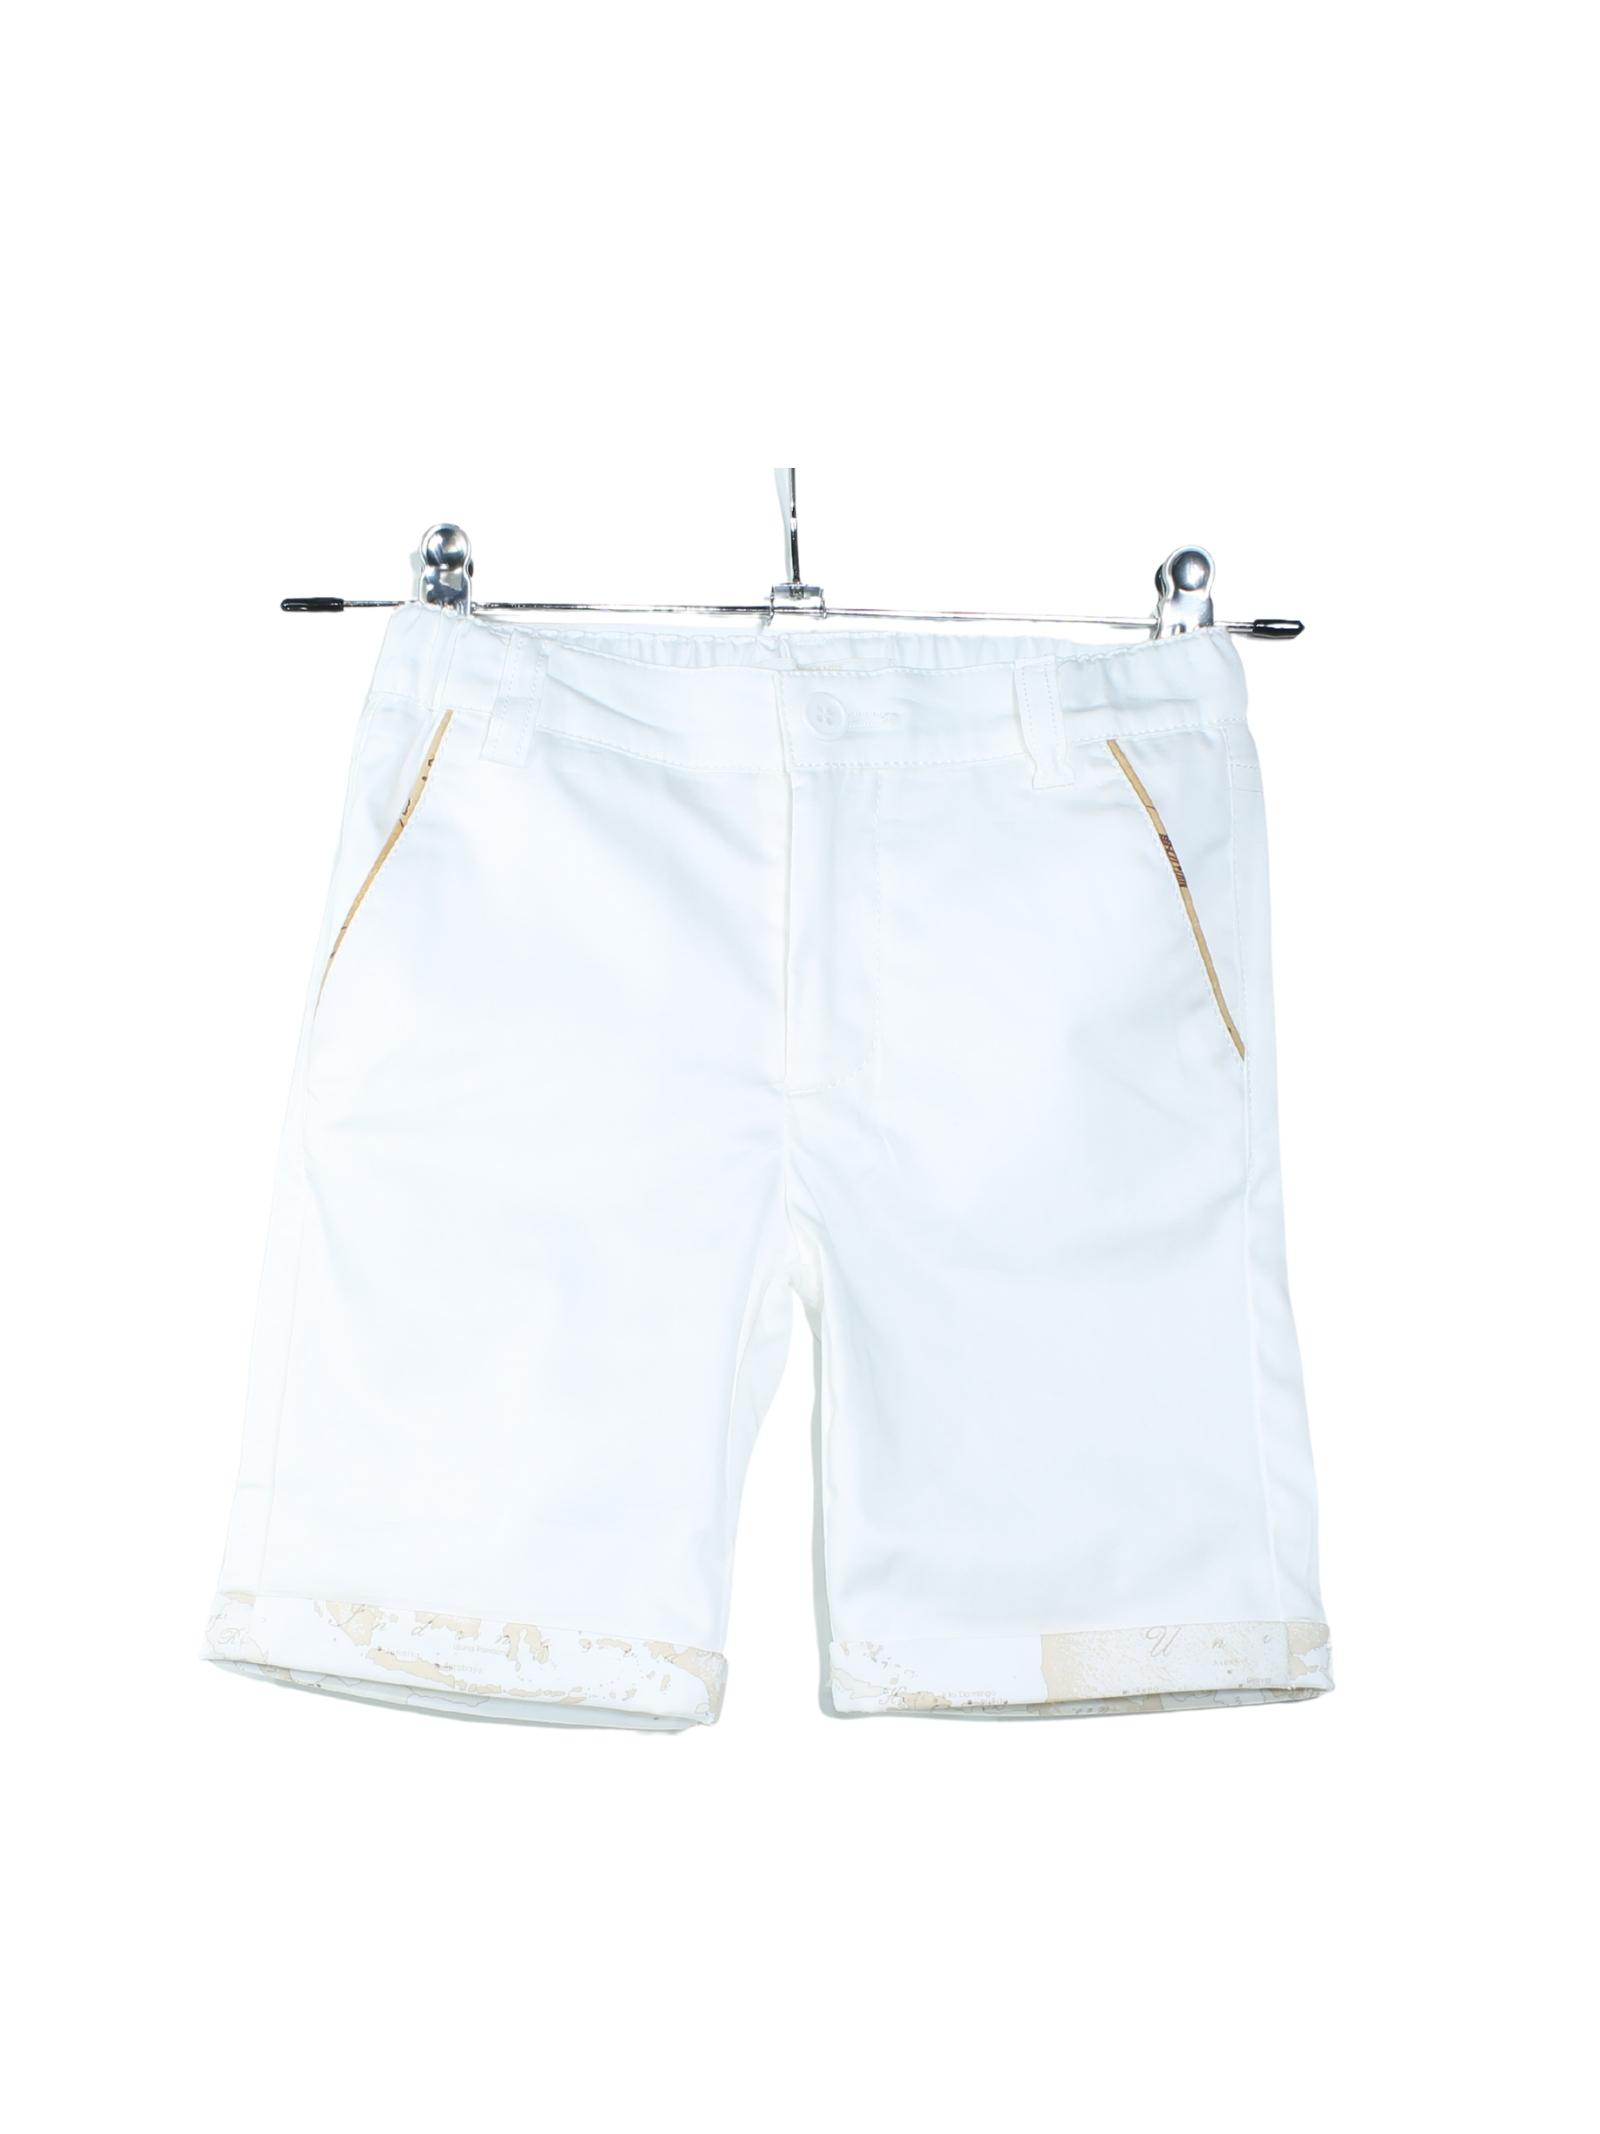 Pantalone Neonato White ALVIERO MARTINI 1° CLASSE JUNIOR | Pantaloni | 2576P0367WHITE